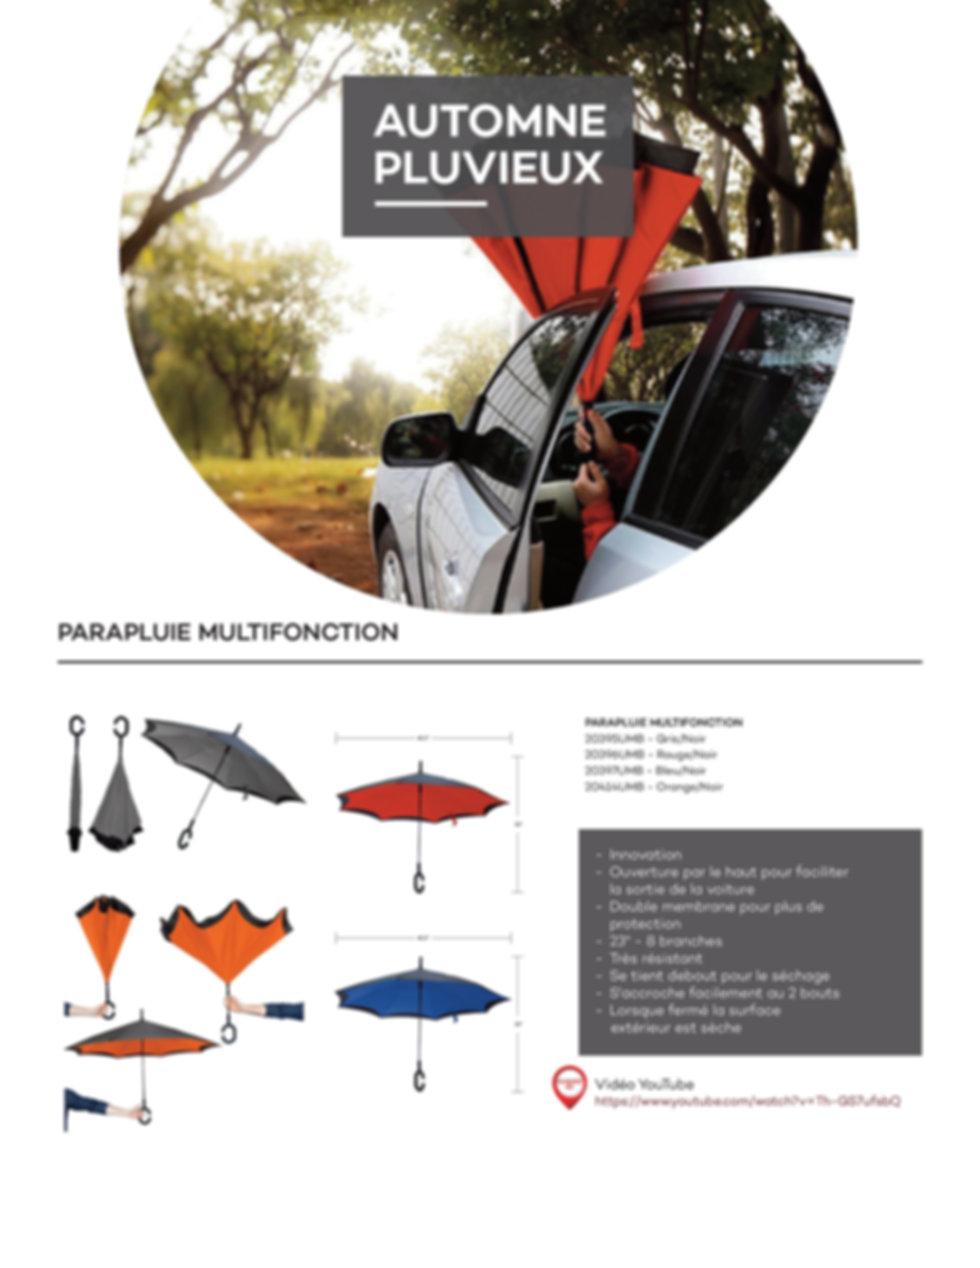 Parapluie multifonction.jpg